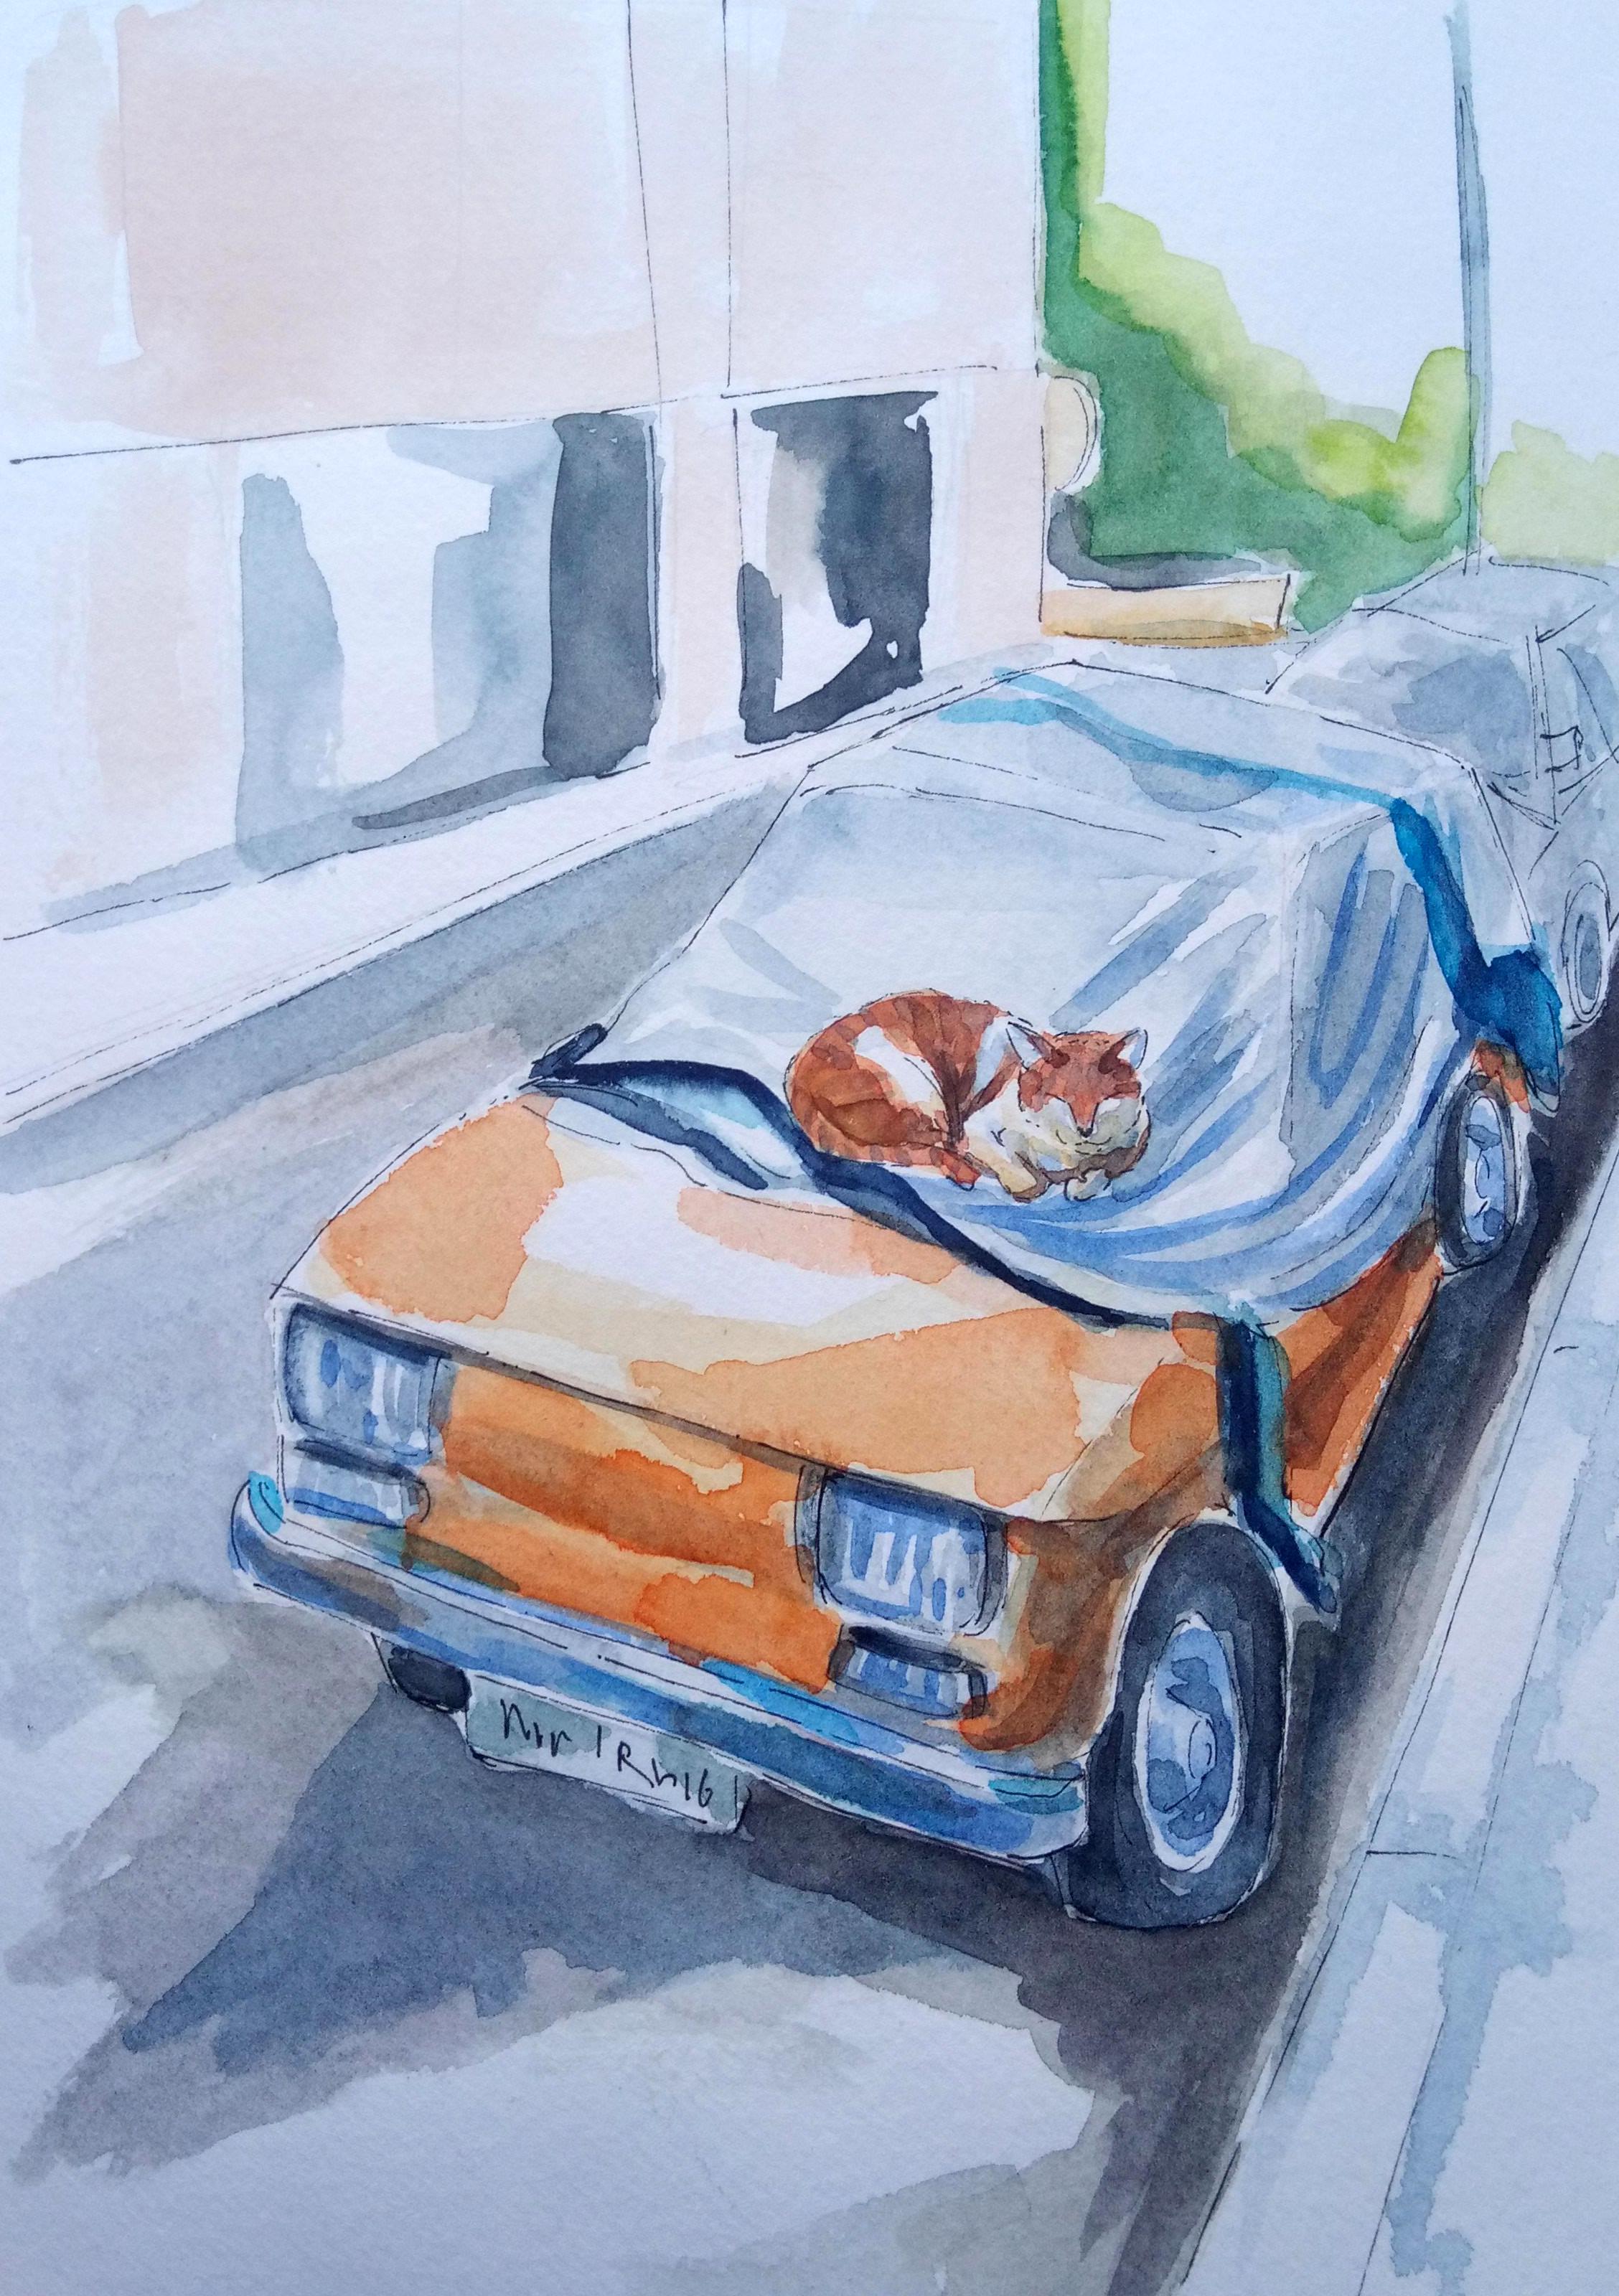 190405 Cat on car Athens Kypseli_Melanie Franz